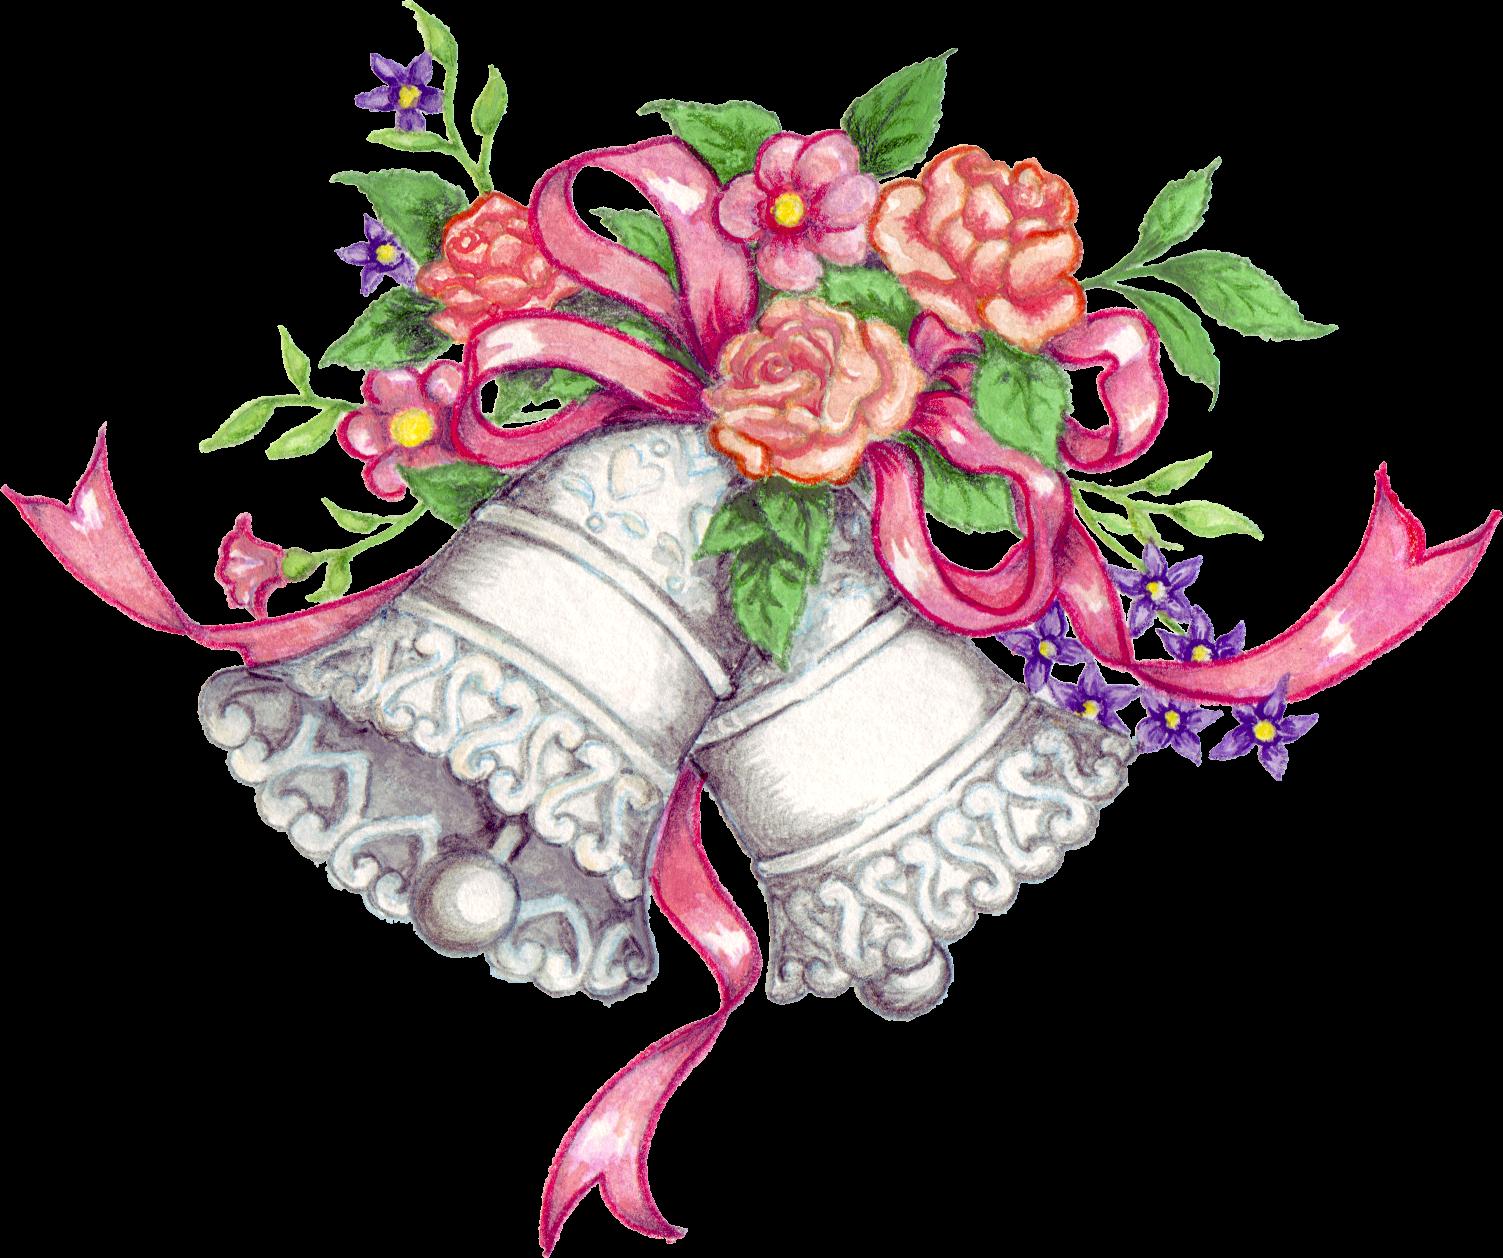 Bells clipart design. Free bell cliparts download